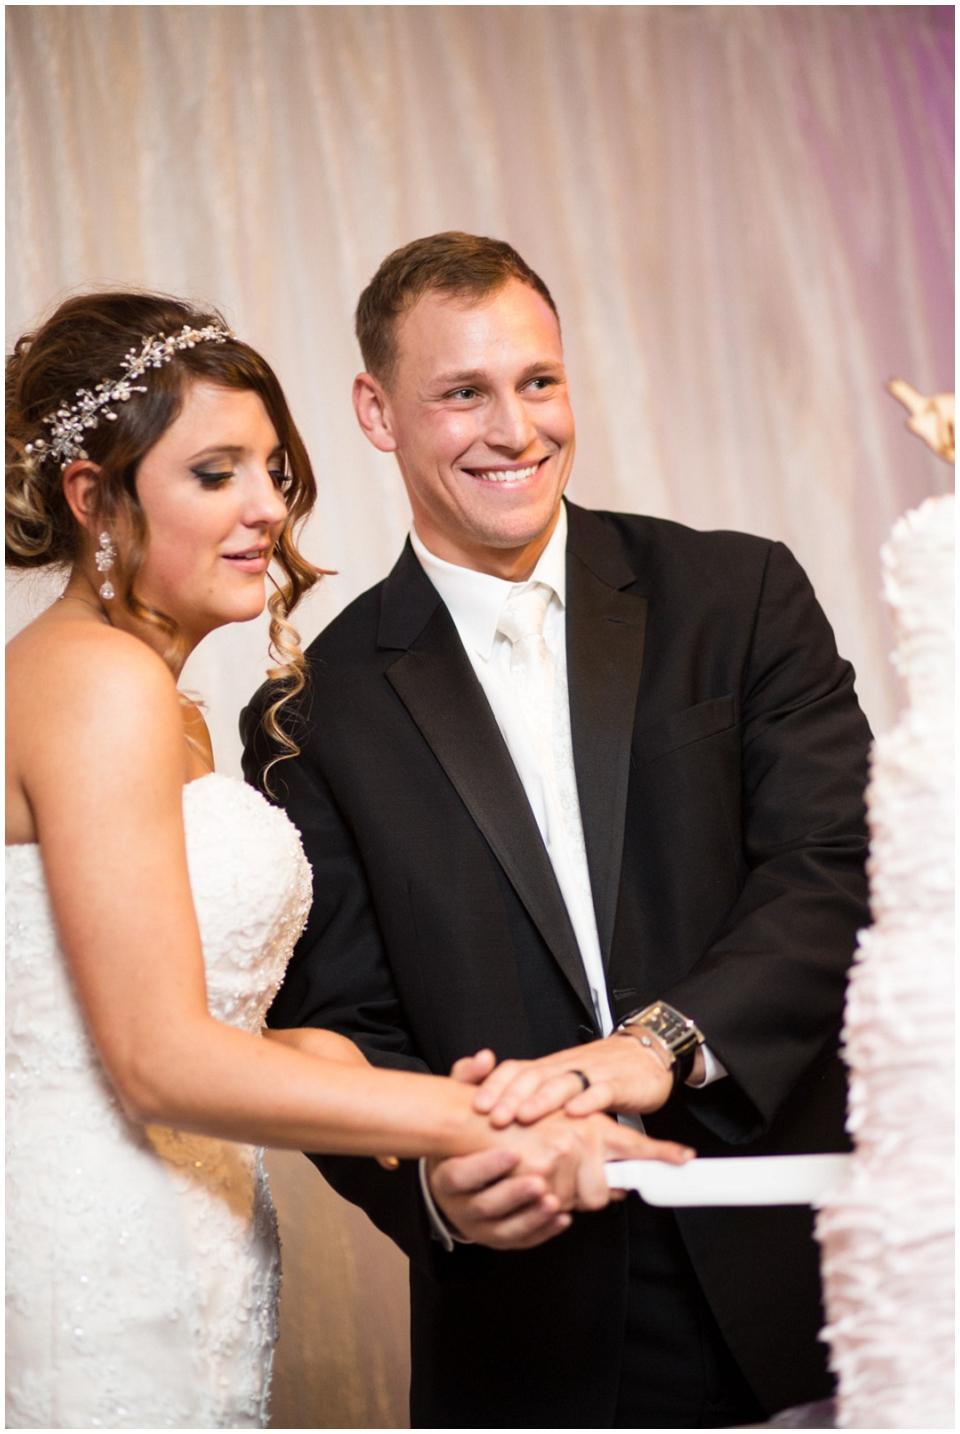 MackenzieJordan-Wedding-095.jpg